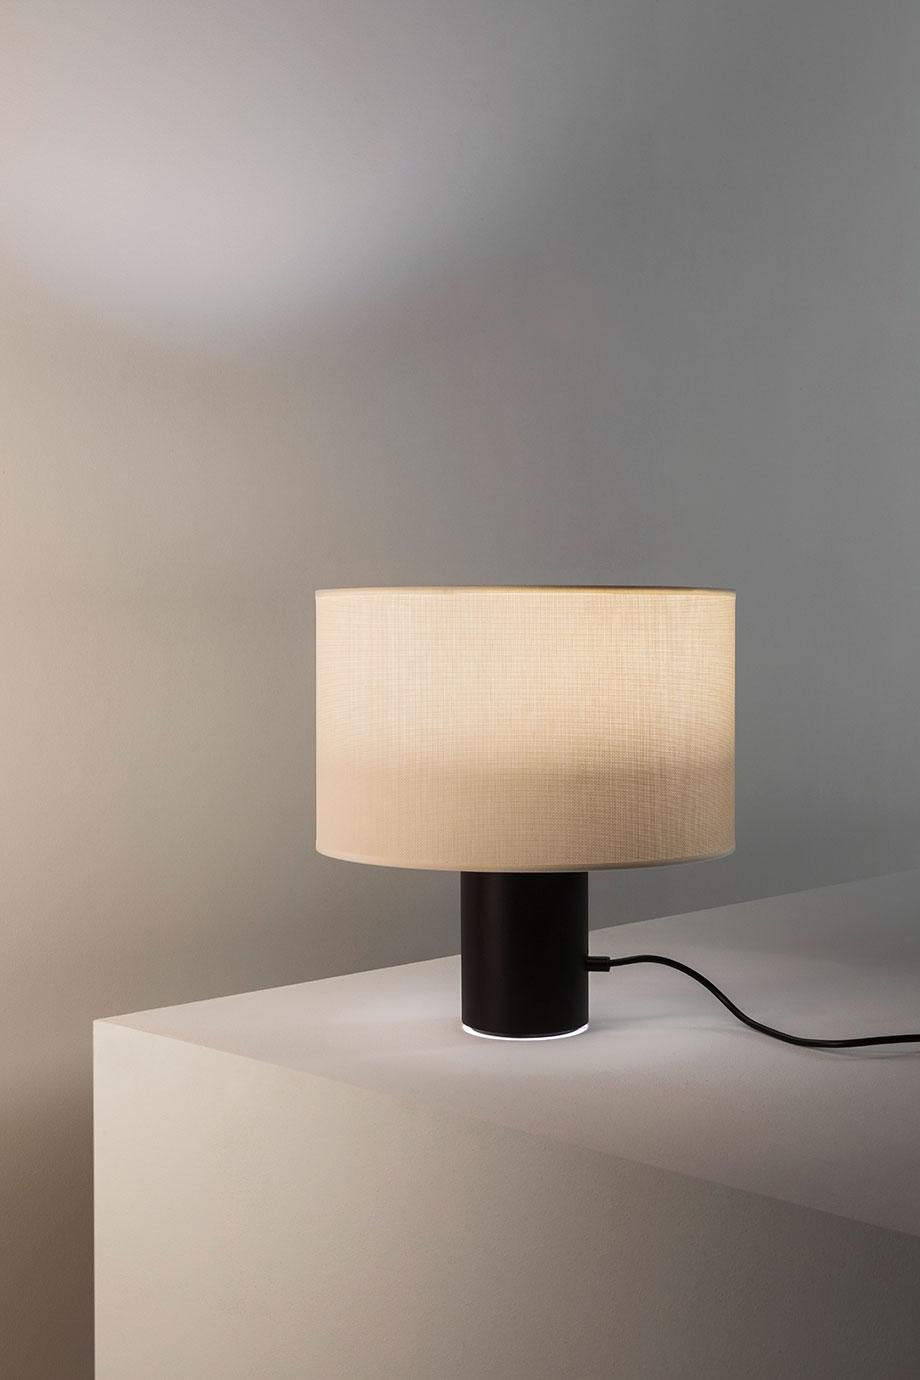 lamparas cyls de mermelada estudio para estiluz (8)